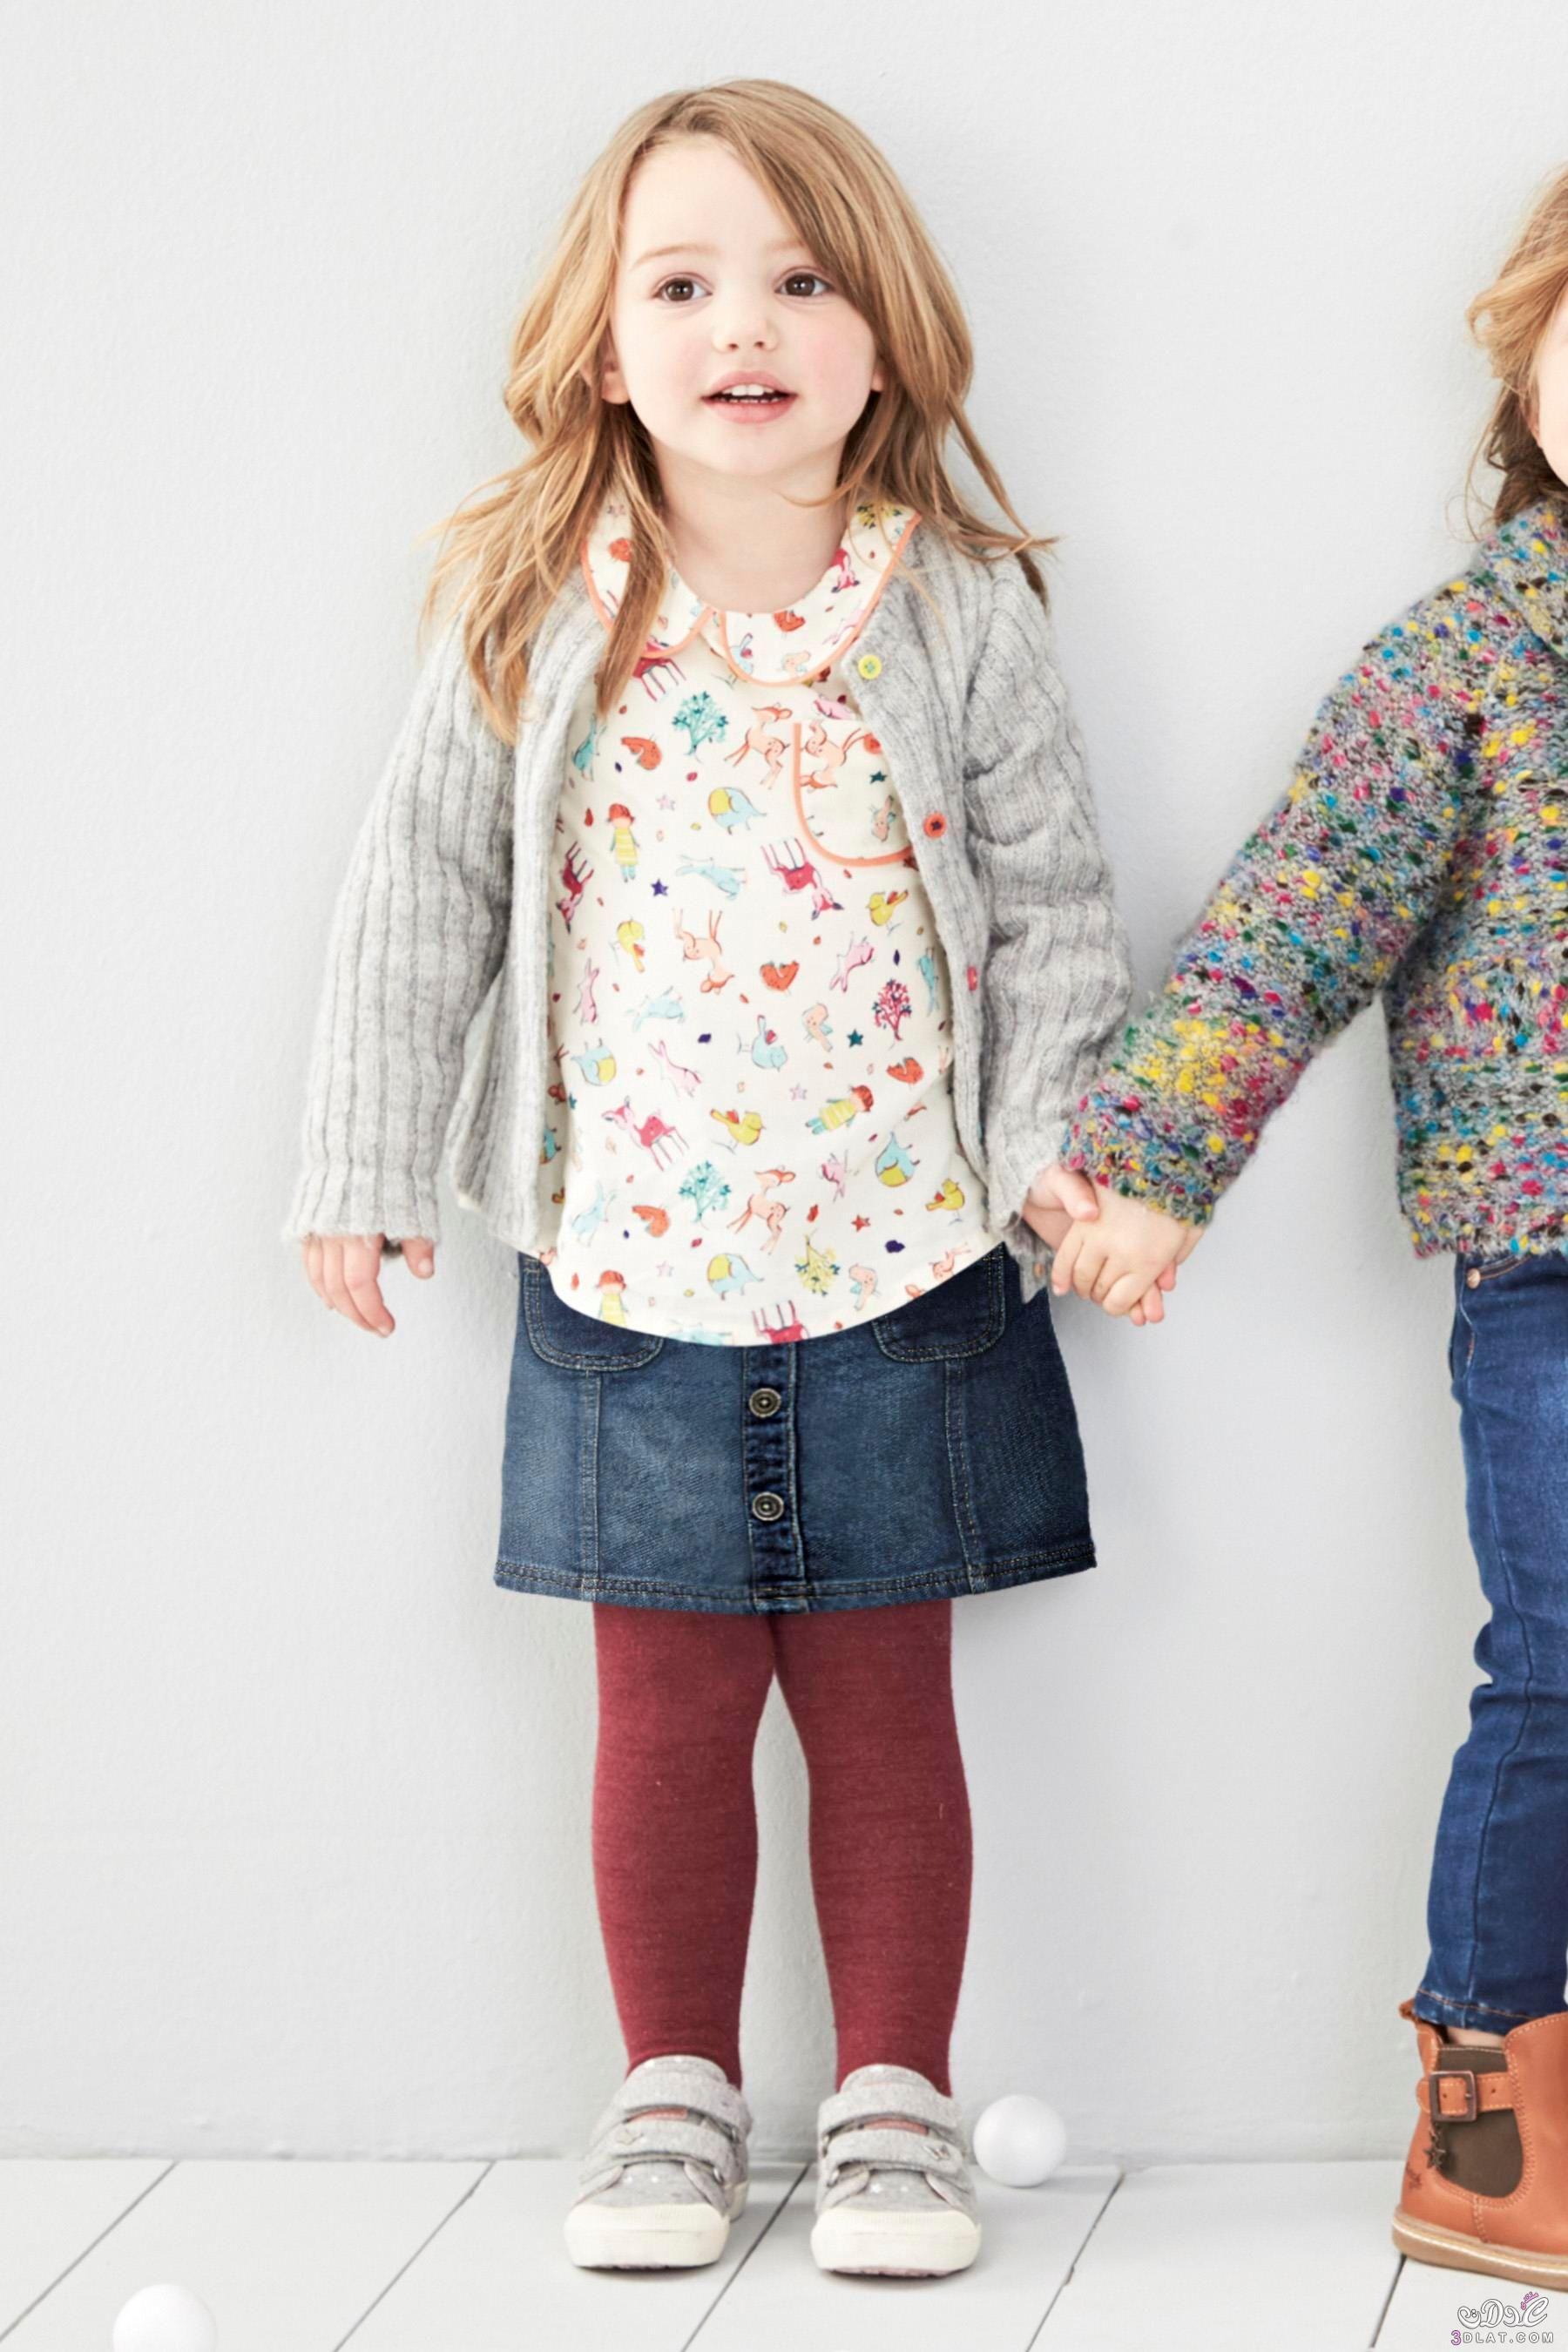 7beb2831c ملابس بنوتات لشتاء 2020..اجدد موديلات ملابس الاطفال..ملابس اطفال بماركات  عالمية